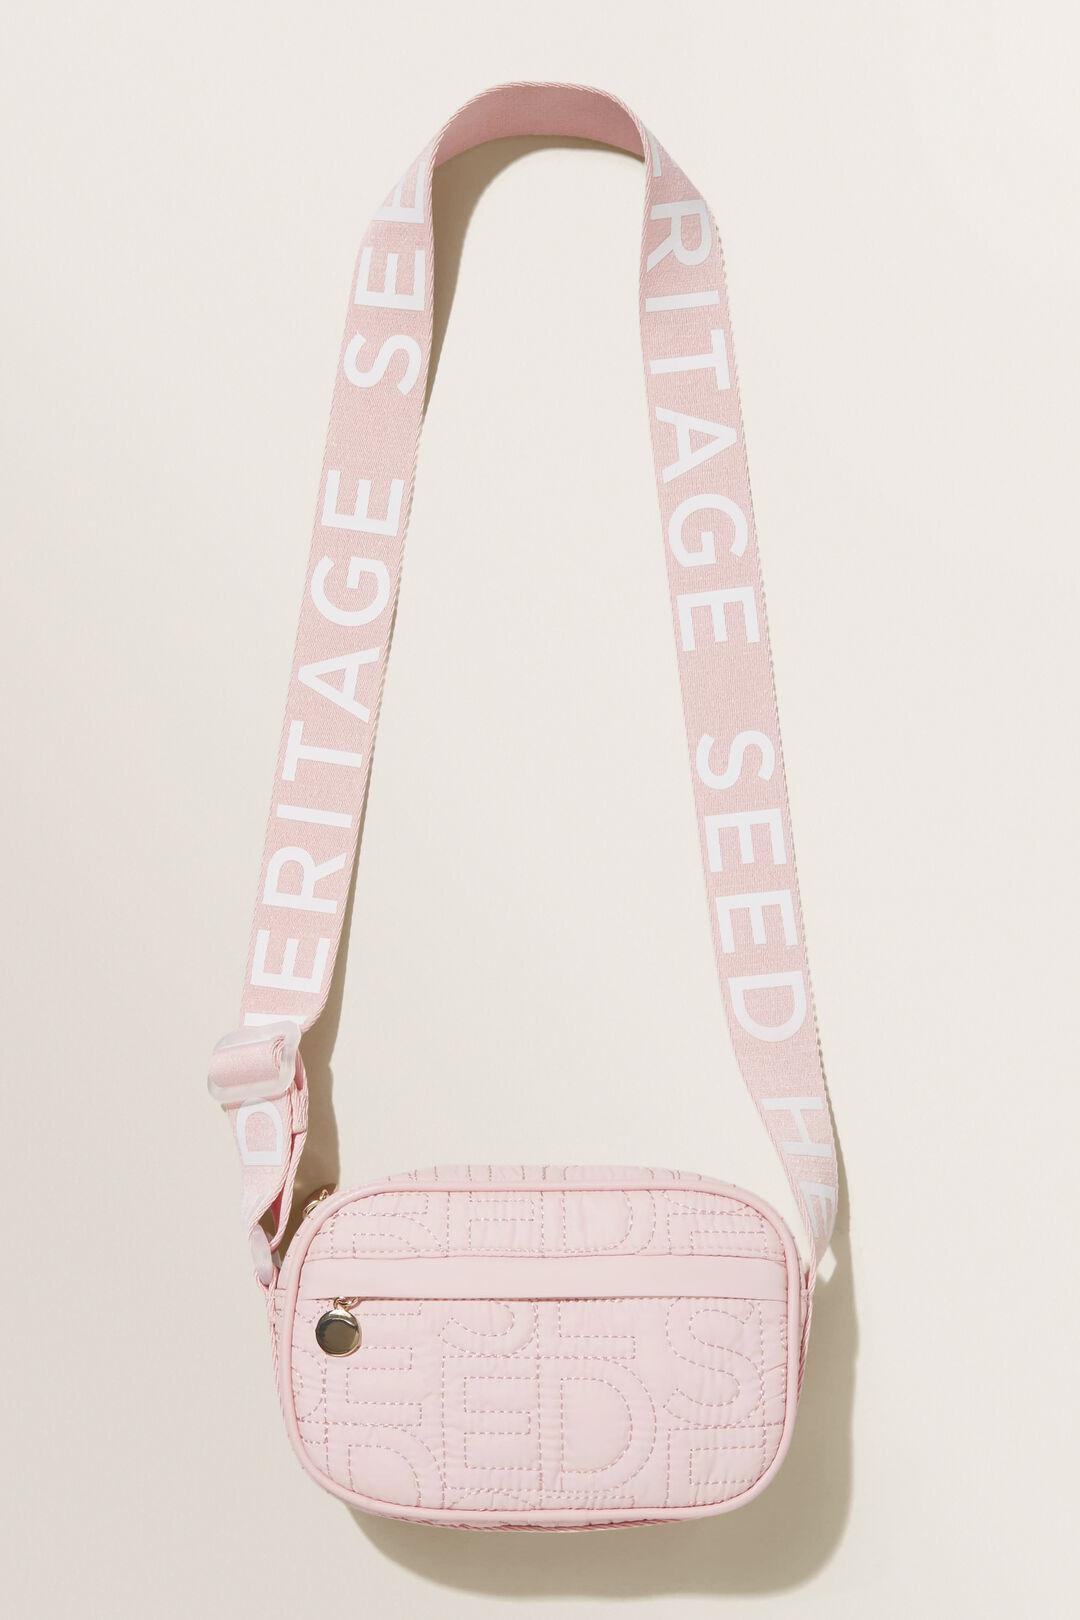 Heritage Crossbody Bag  DUSTY ROSE  hi-res